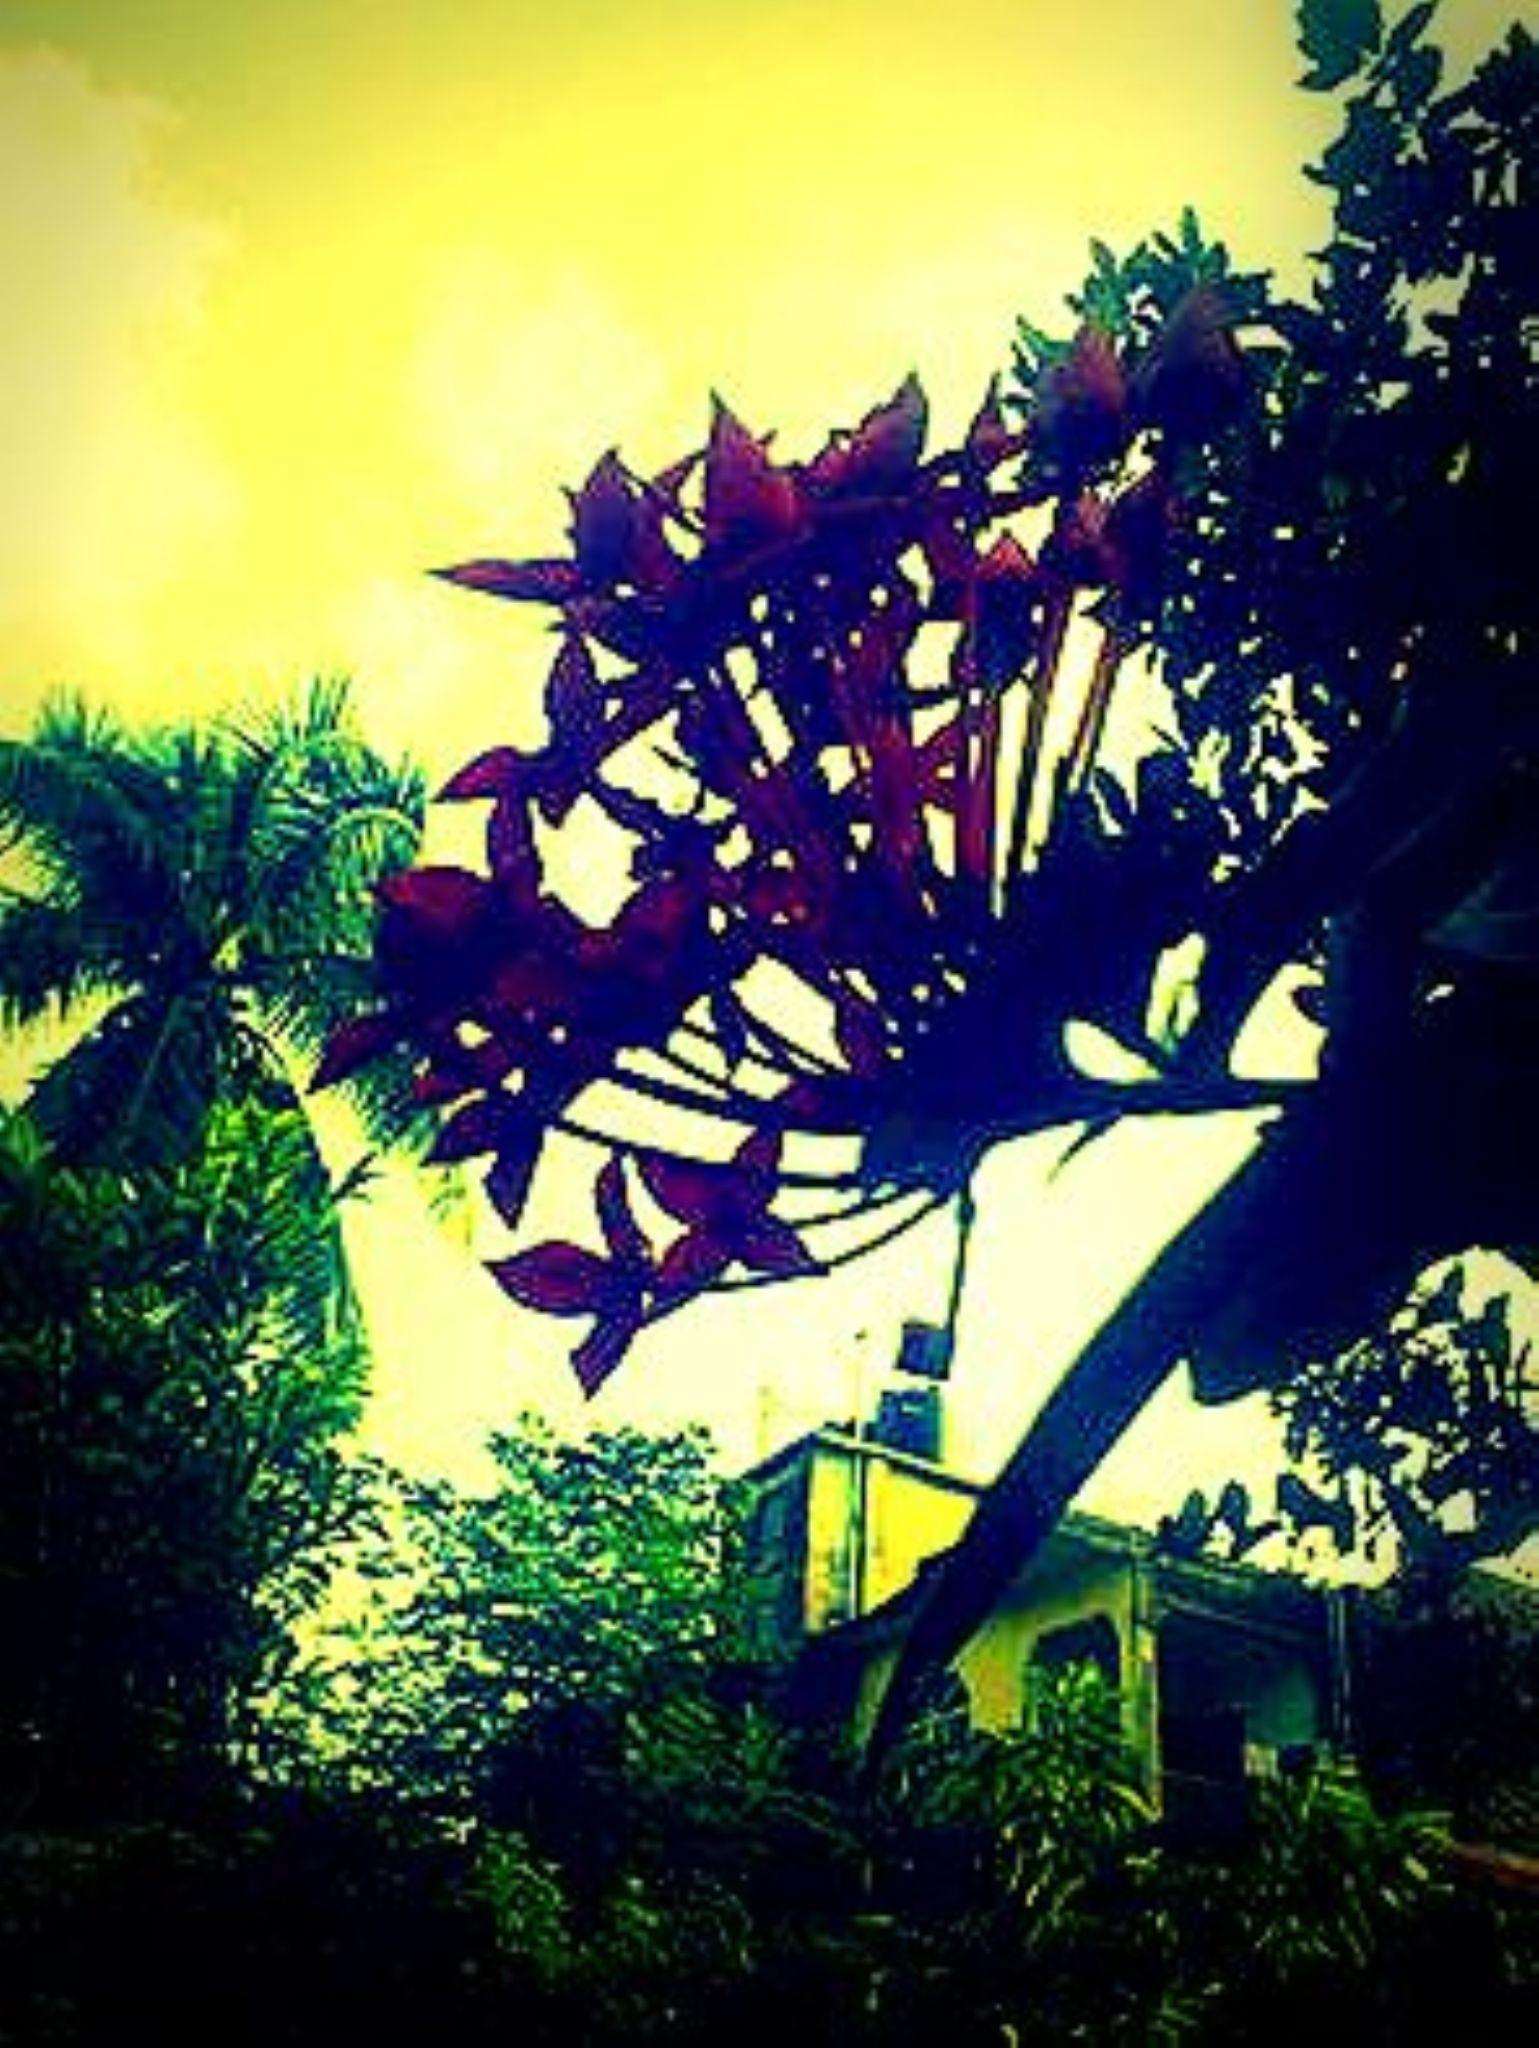 MiD  Day ...!! clk........ by Sudhanshu Shekhar